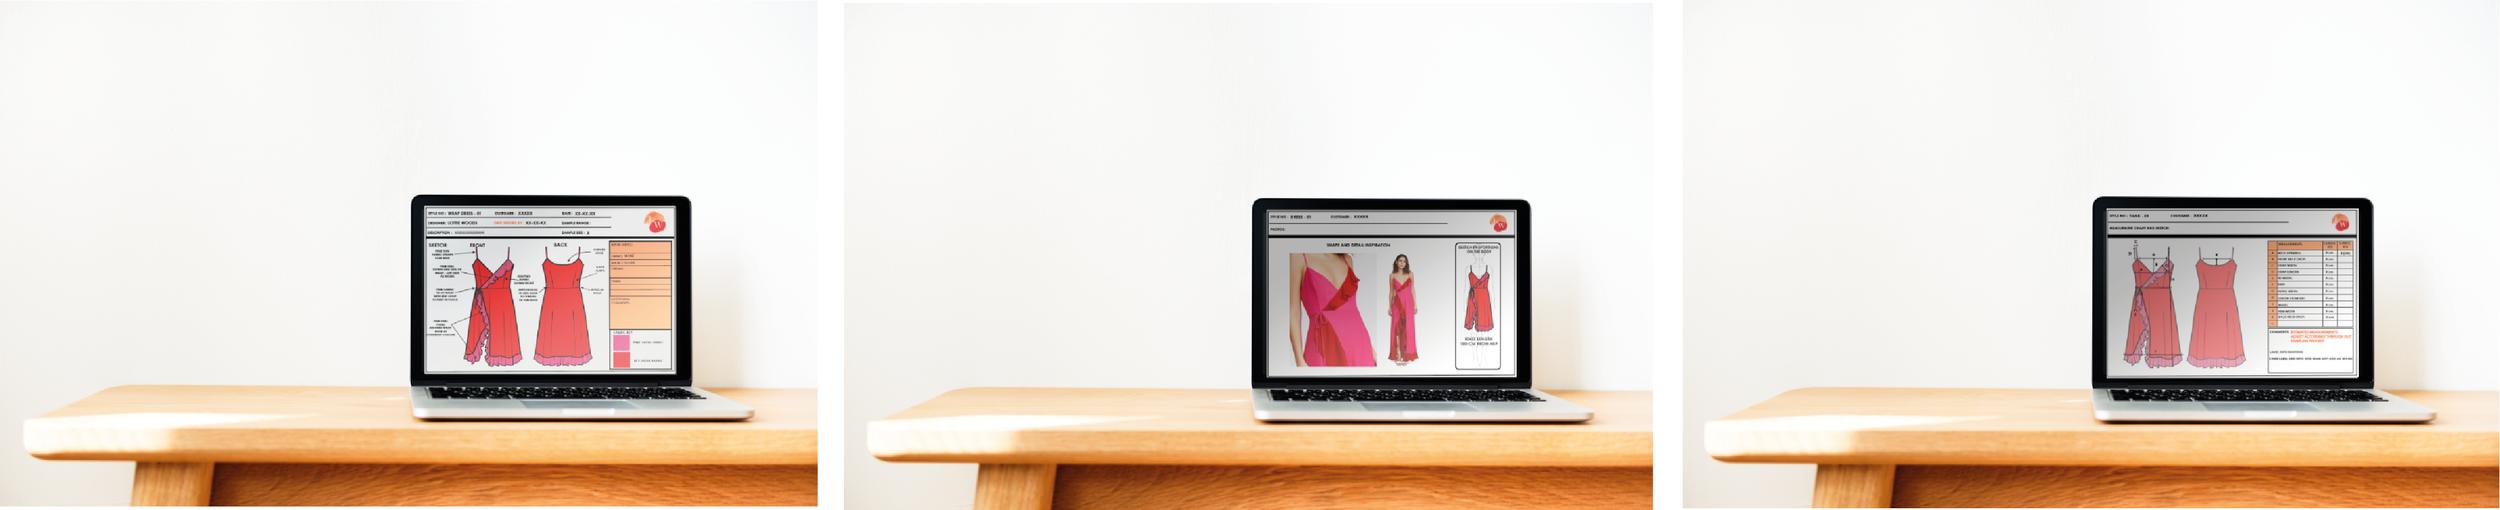 Tech Pack Examples - Lottie Woods Design - Freelance Design Work - Tech Pack.png